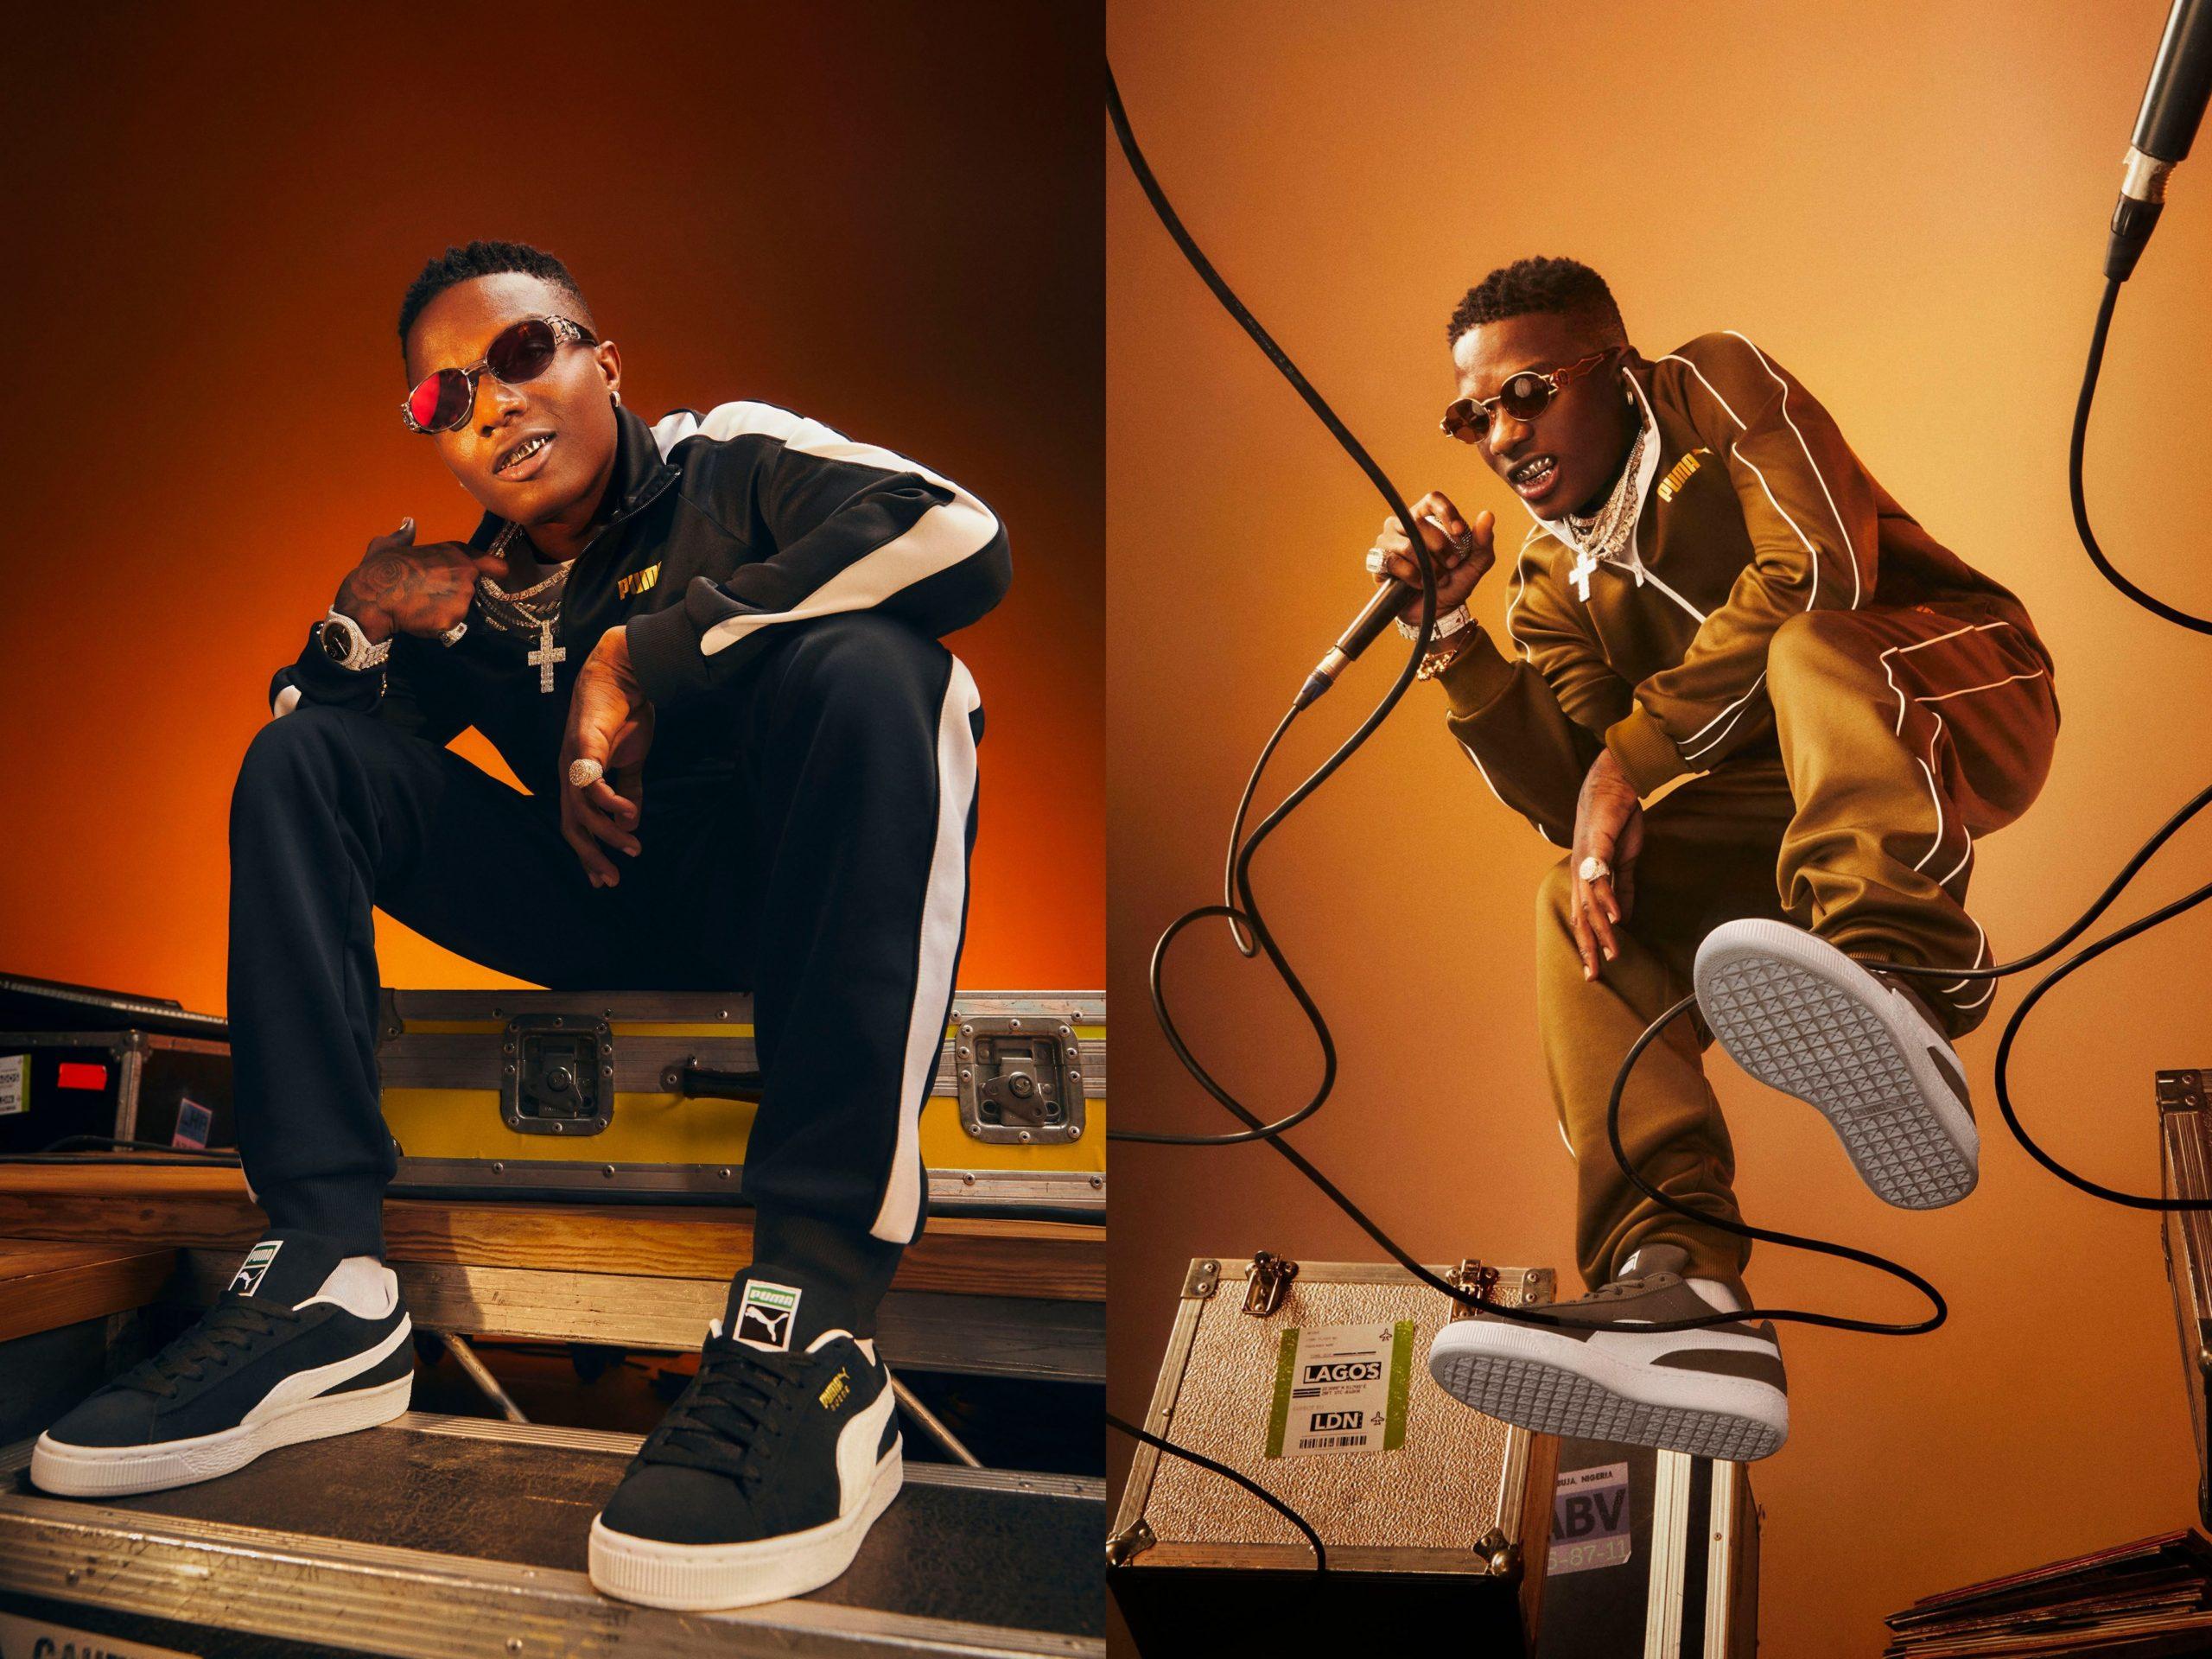 PUMA Announces Wizkid as the Ambassador for PUMA x JD Sports Suede Campaign